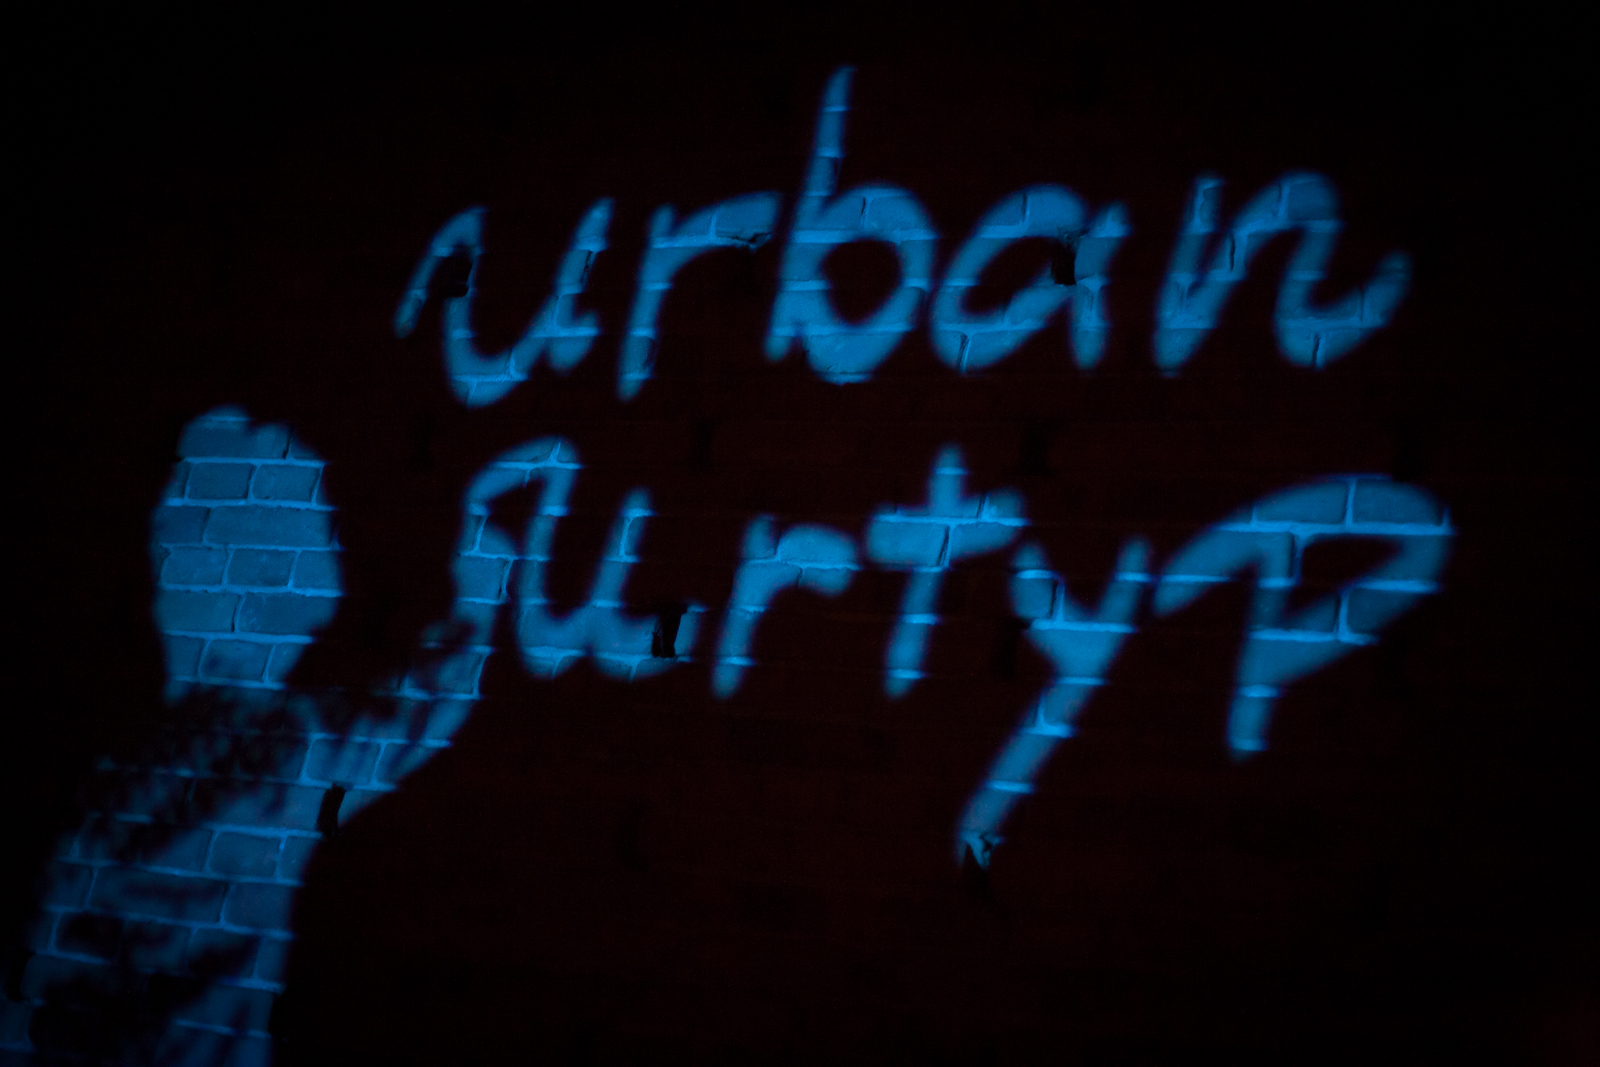 20120923-urban-urtyp-025